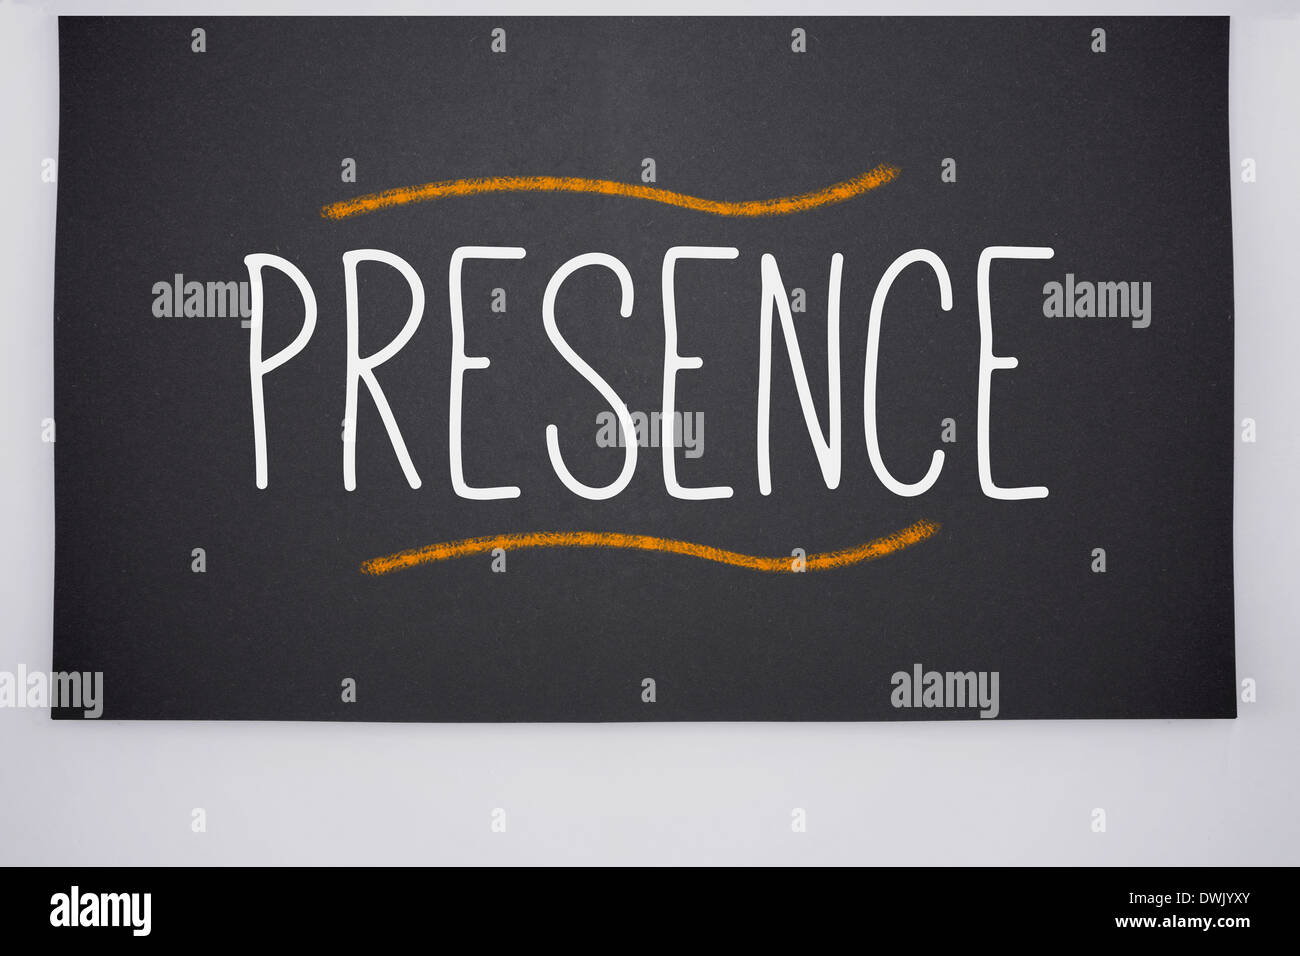 Präsenz auf große Tafel geschrieben Stockbild